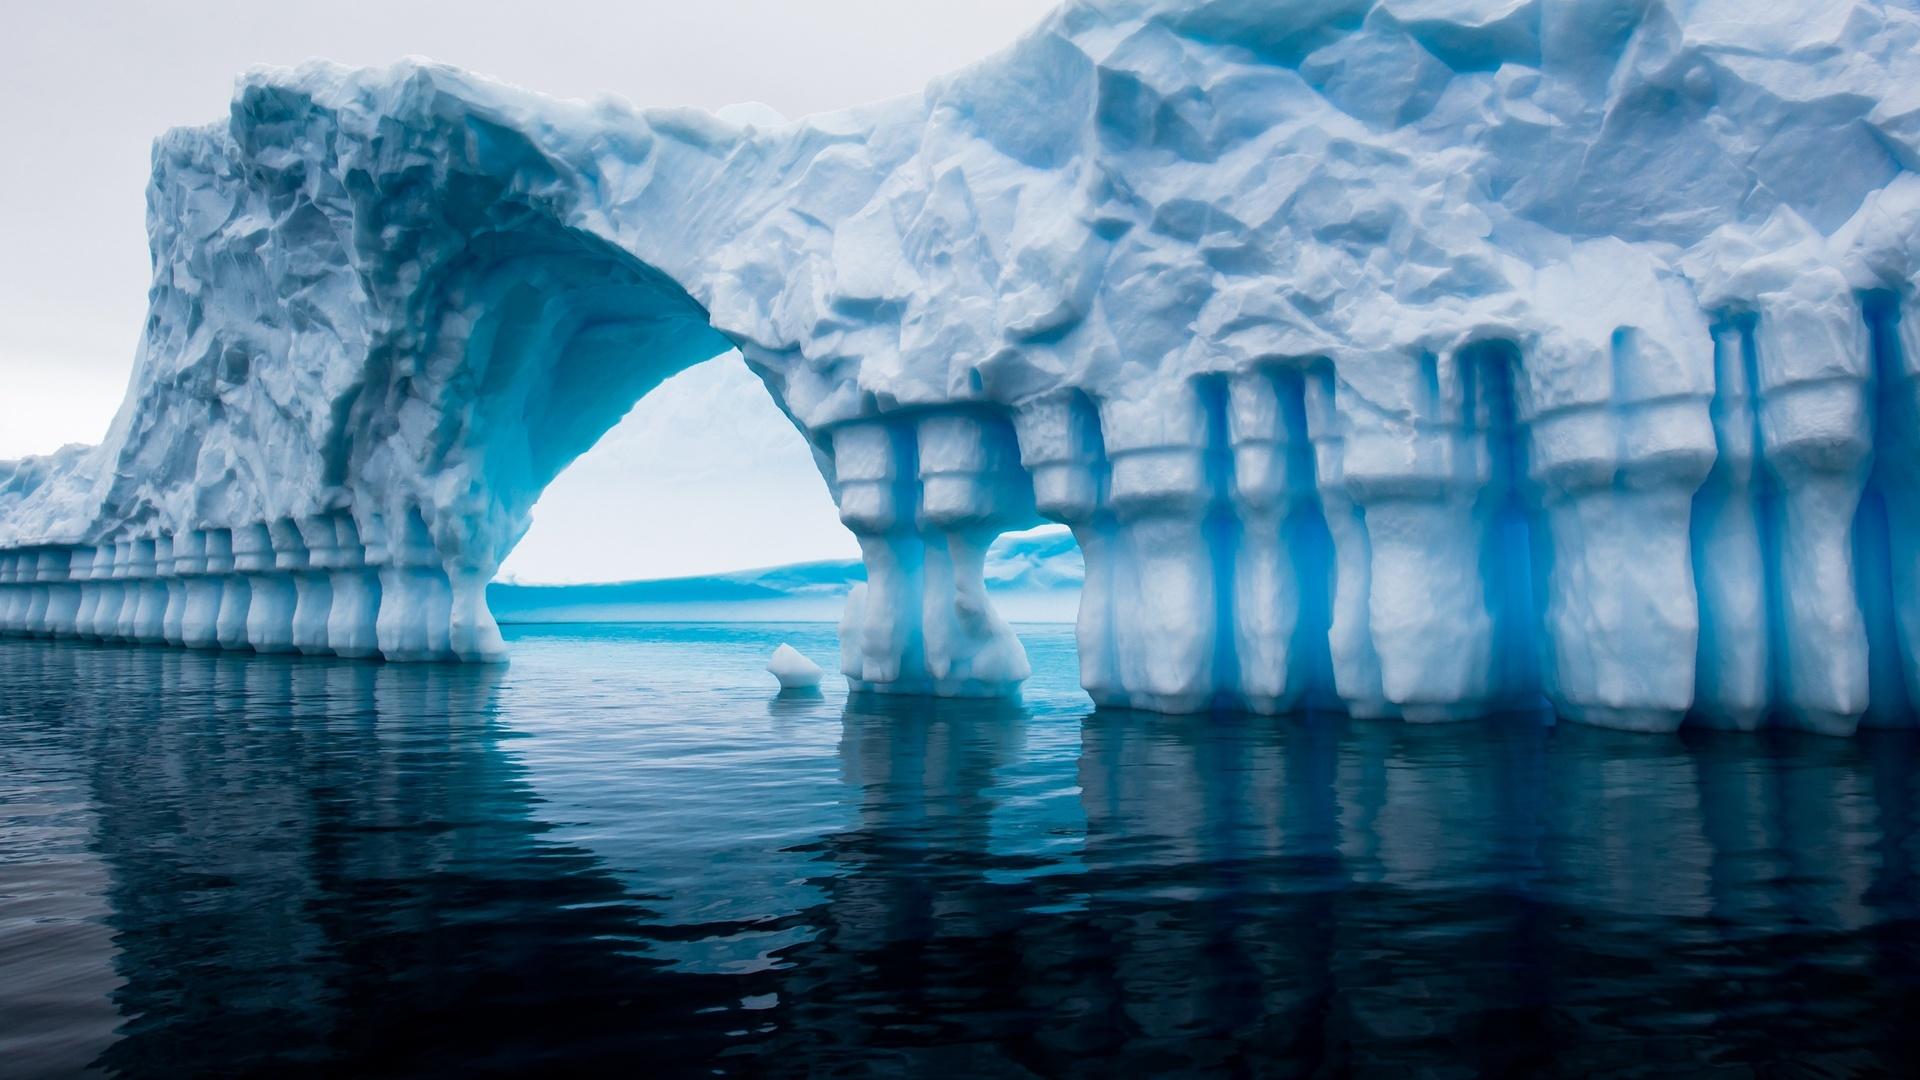 антарктида, айсберг, синий, вода, океан, море, отражение, antarctica